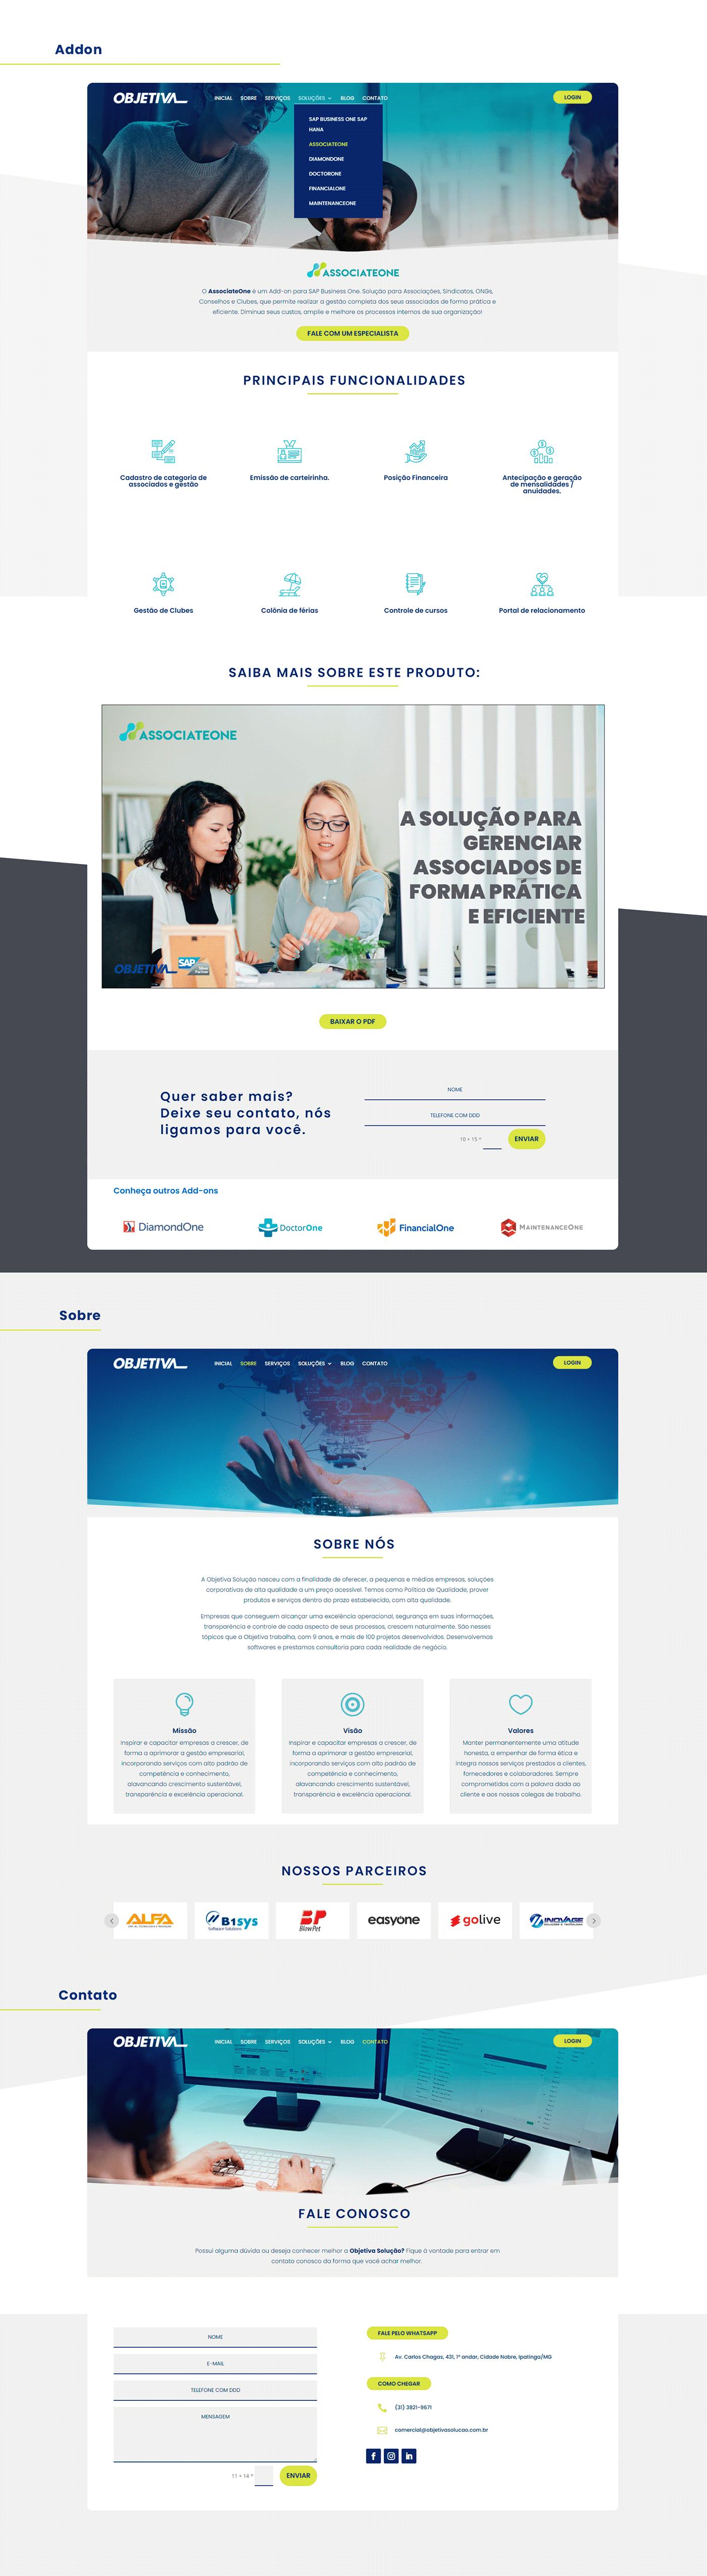 deisign photoshop ui design UX design Web Web Design  Website wordpress